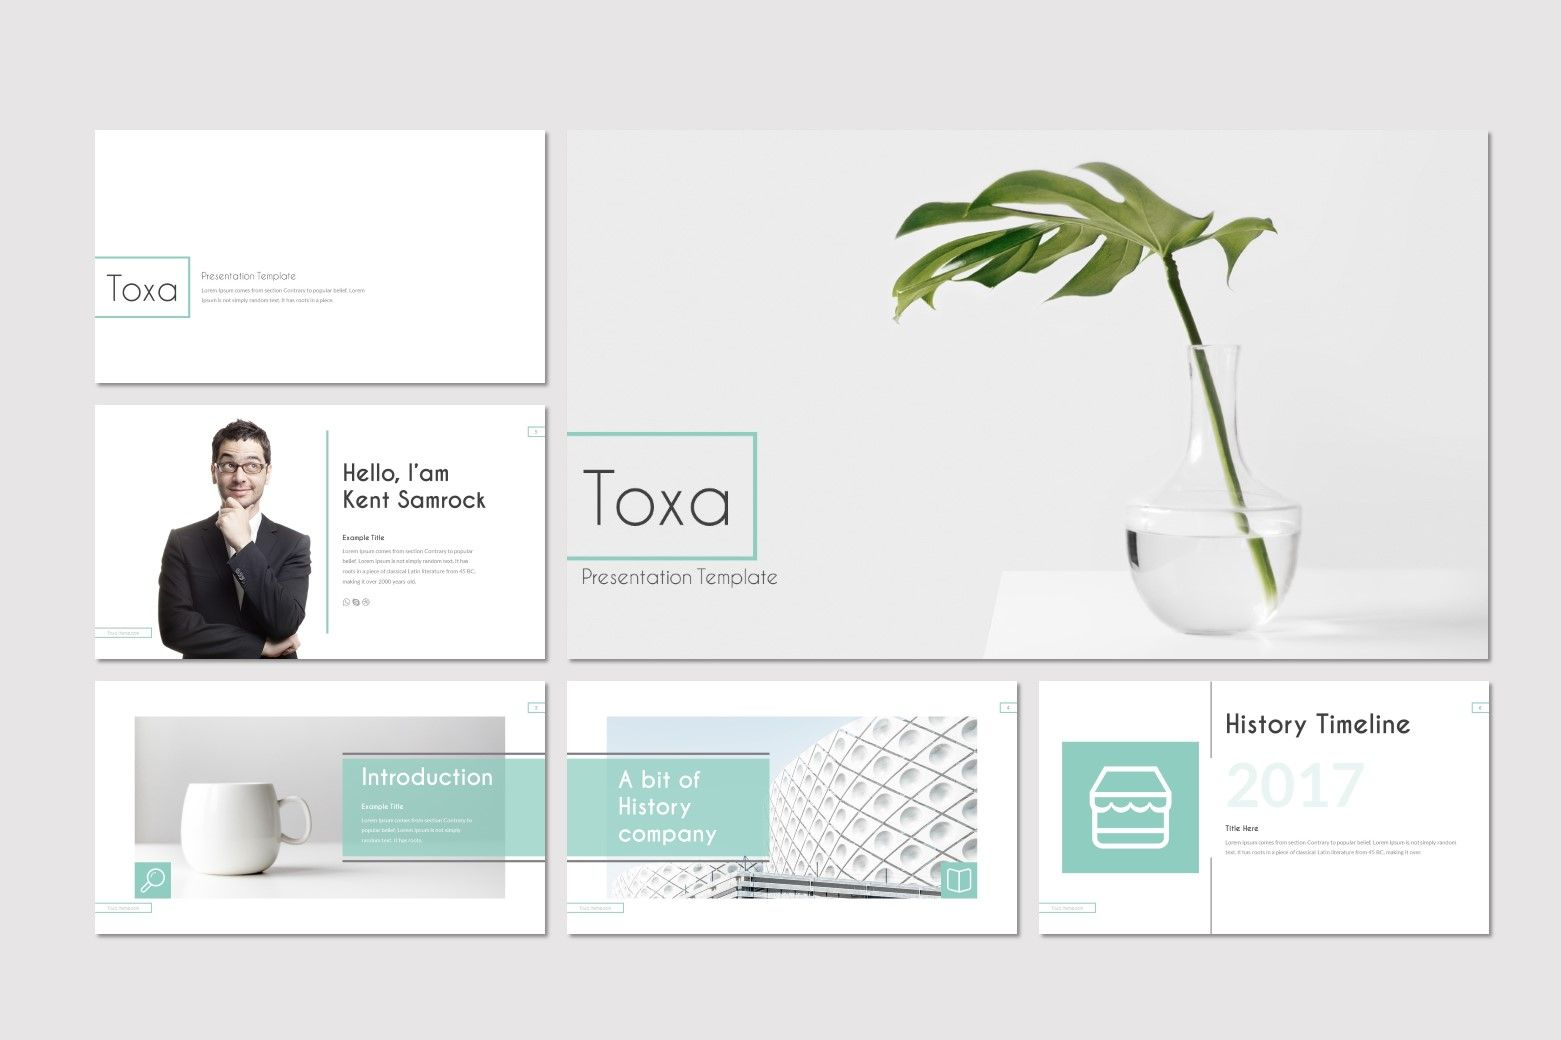 Toxa - Google Slides Template, Slide 2, 08519, Presentation Templates — PoweredTemplate.com